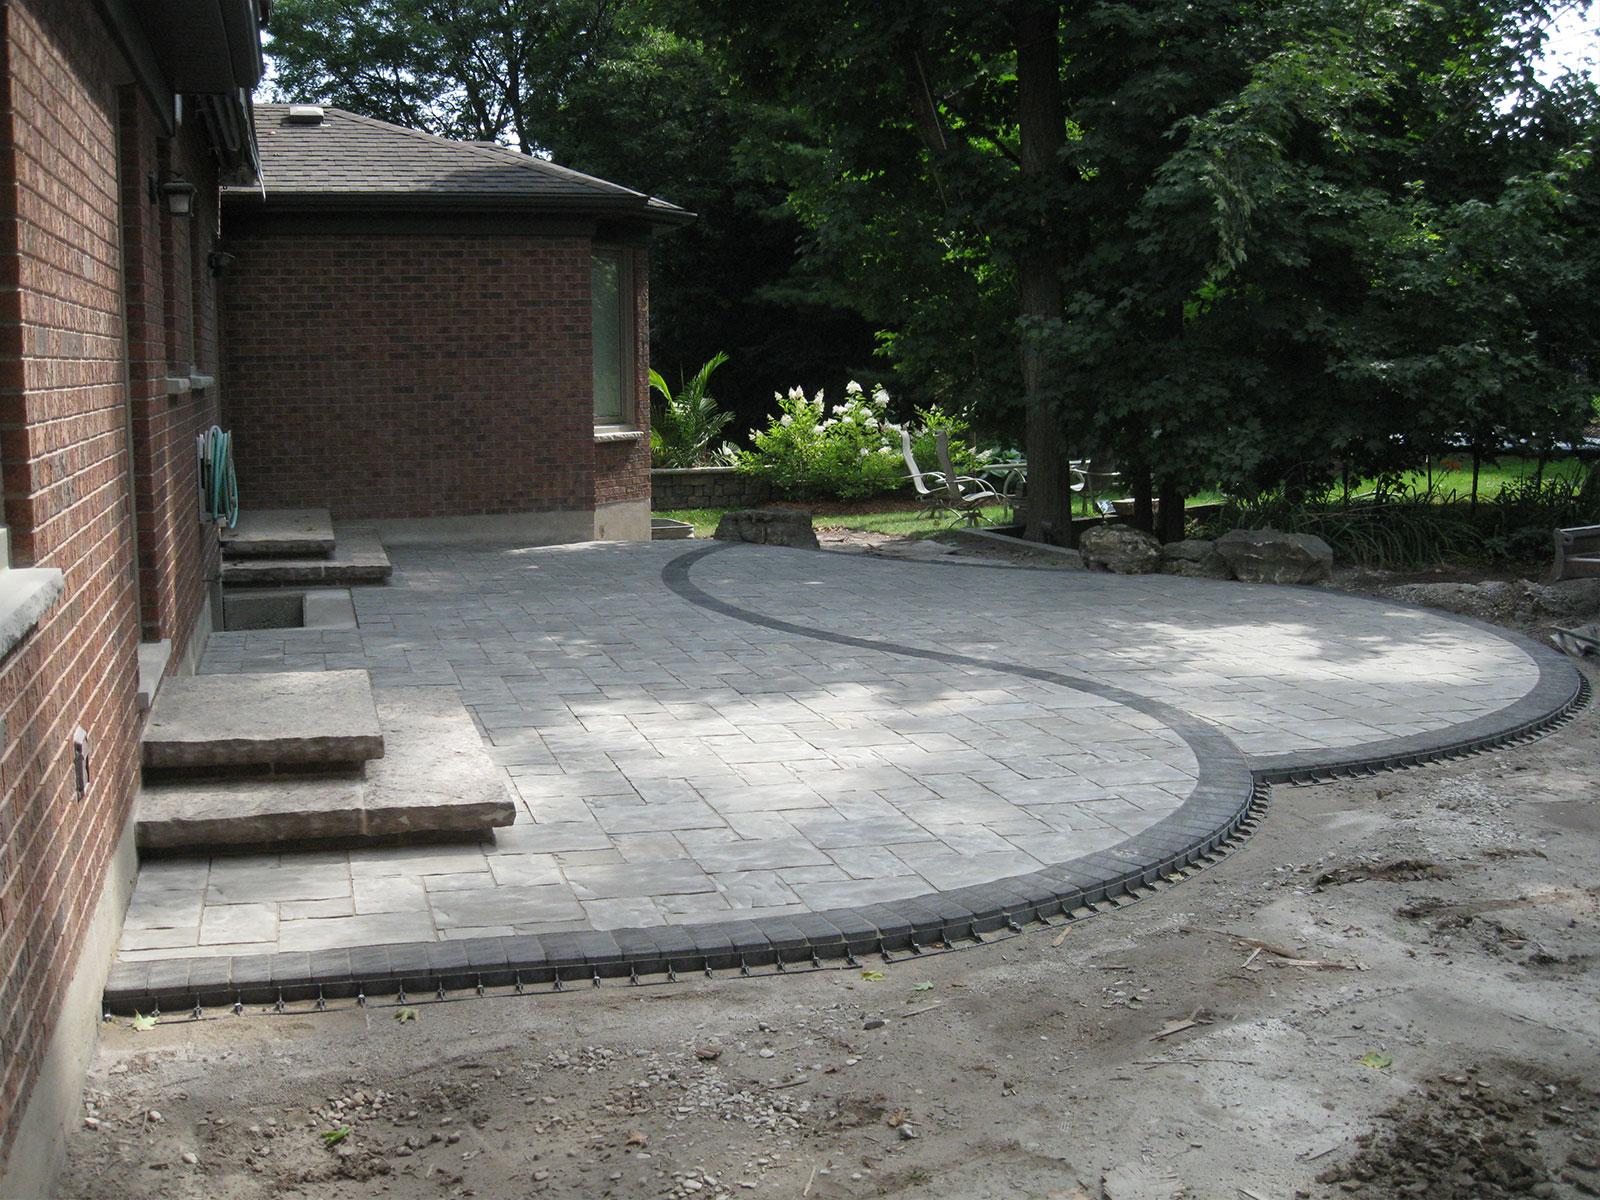 Unilock Concrete Paver Patio Build